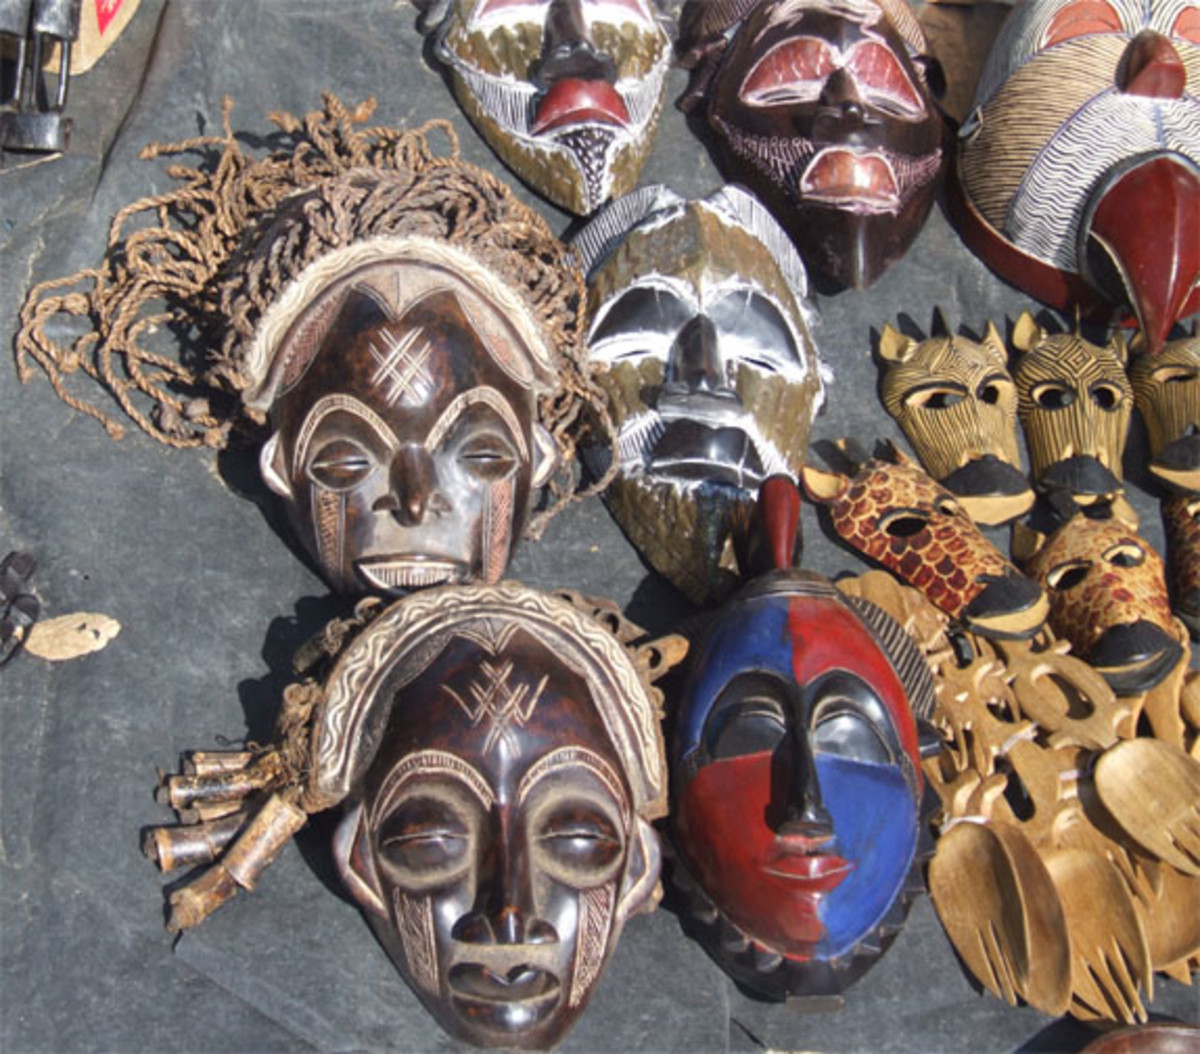 http://danielschereck.com/wp2006/wp-2006africa-namibiawindhoek01.htm